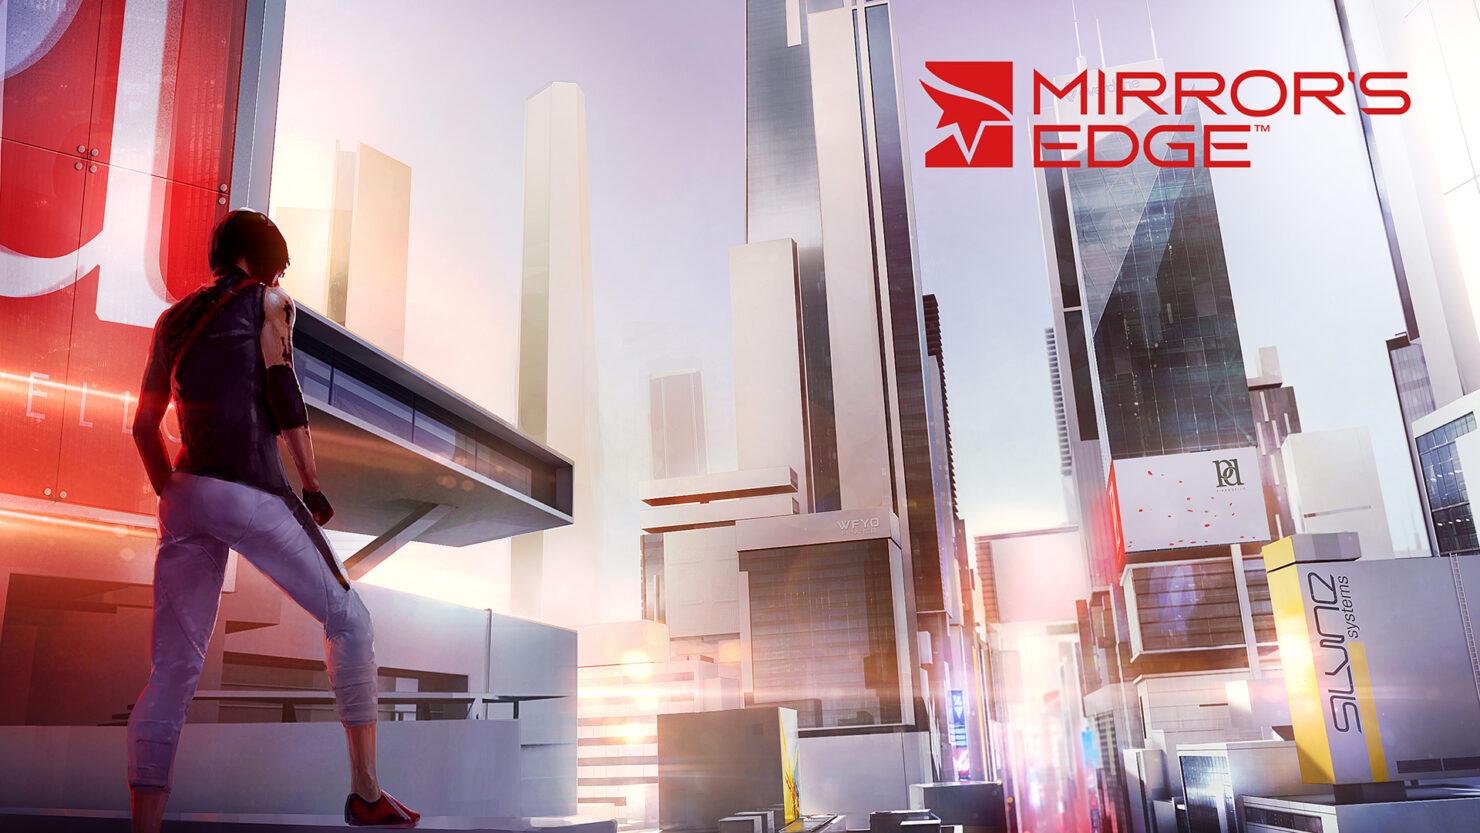 mirrors-edge-vista